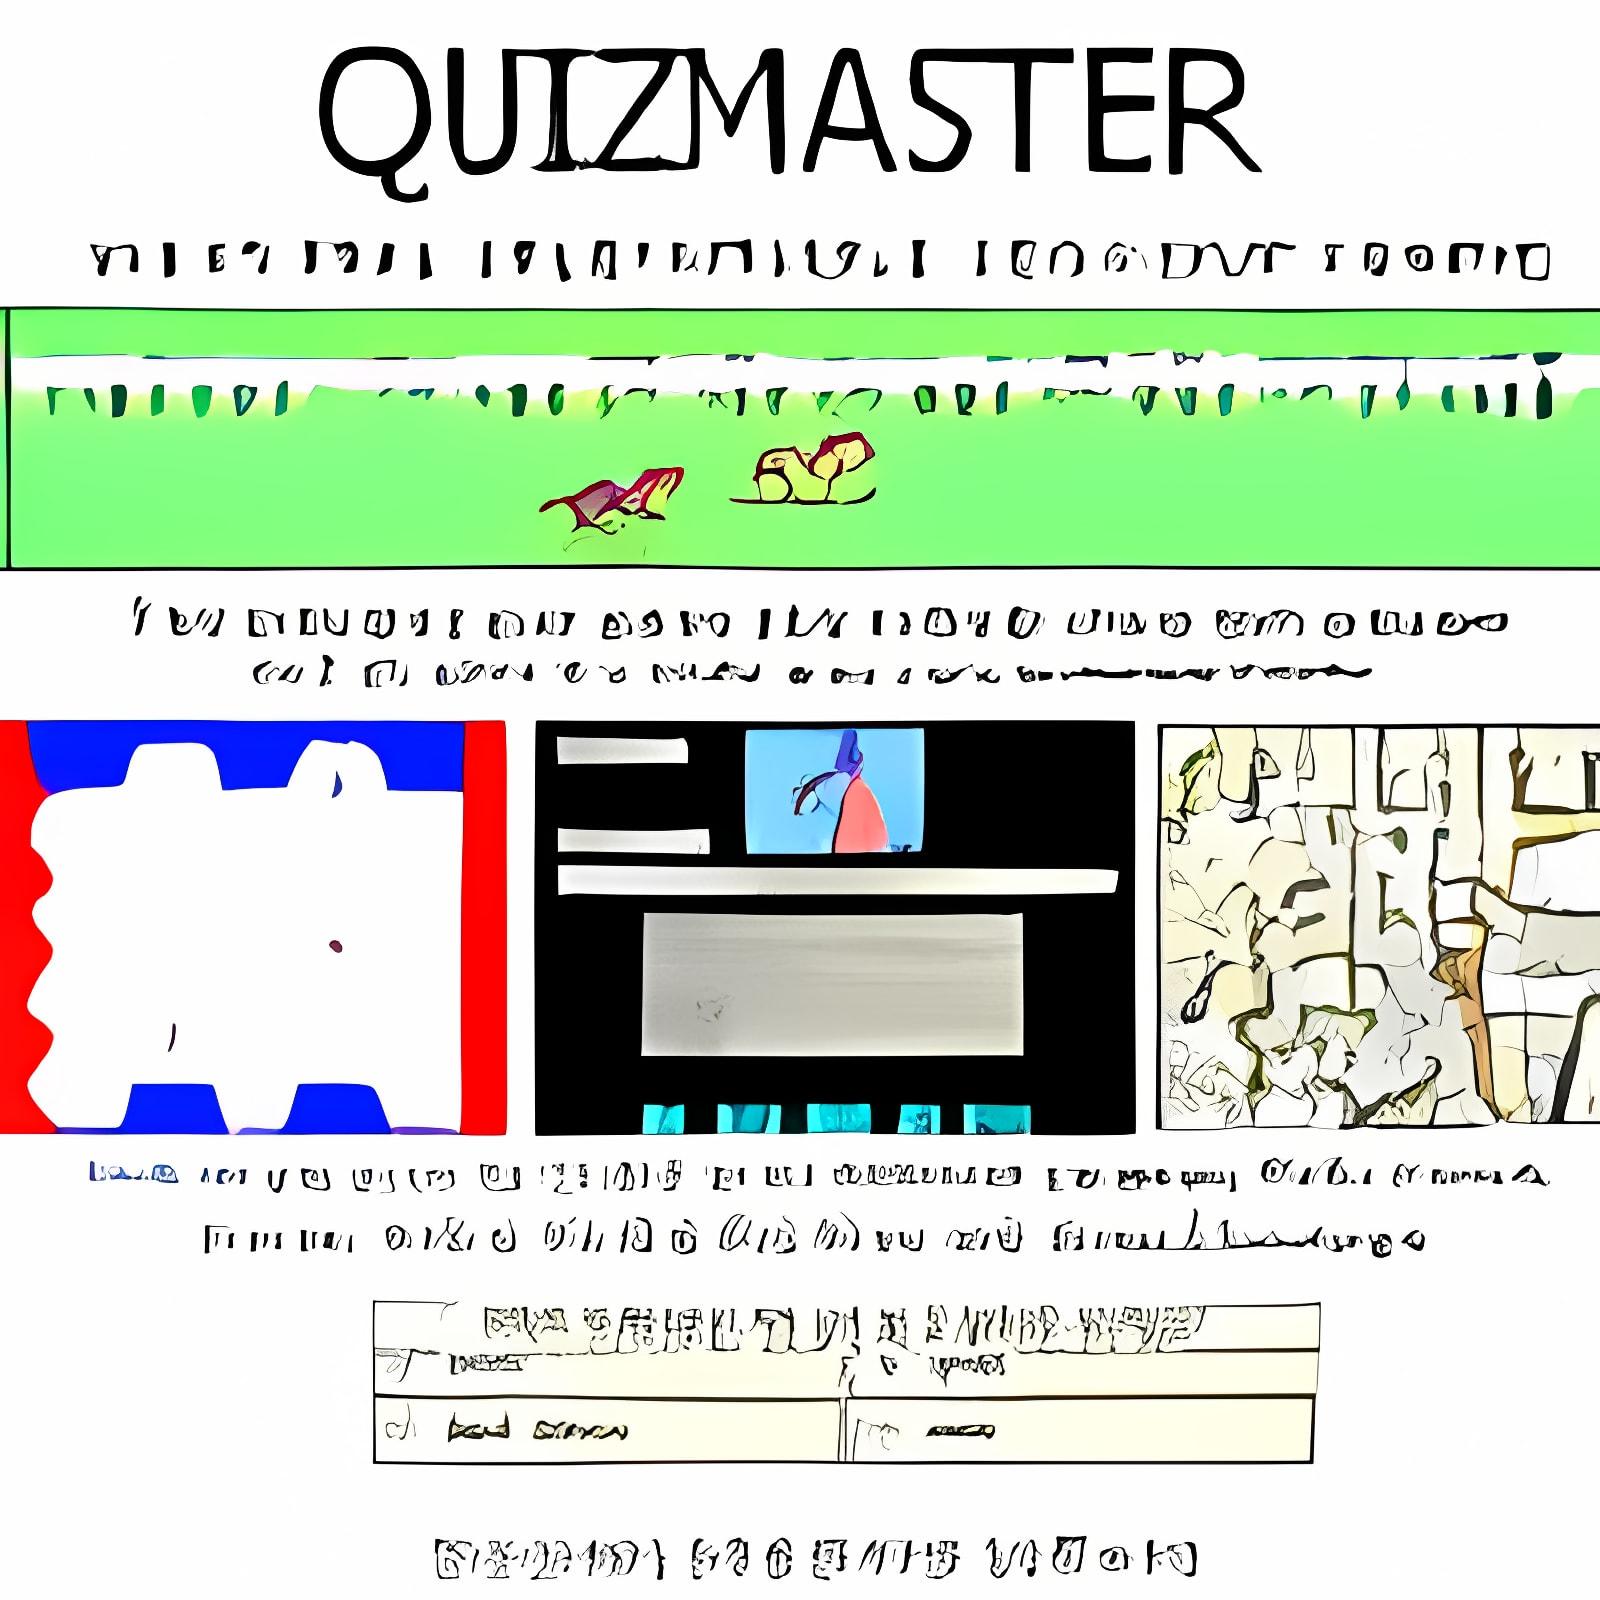 Quizmaster 1.2.3